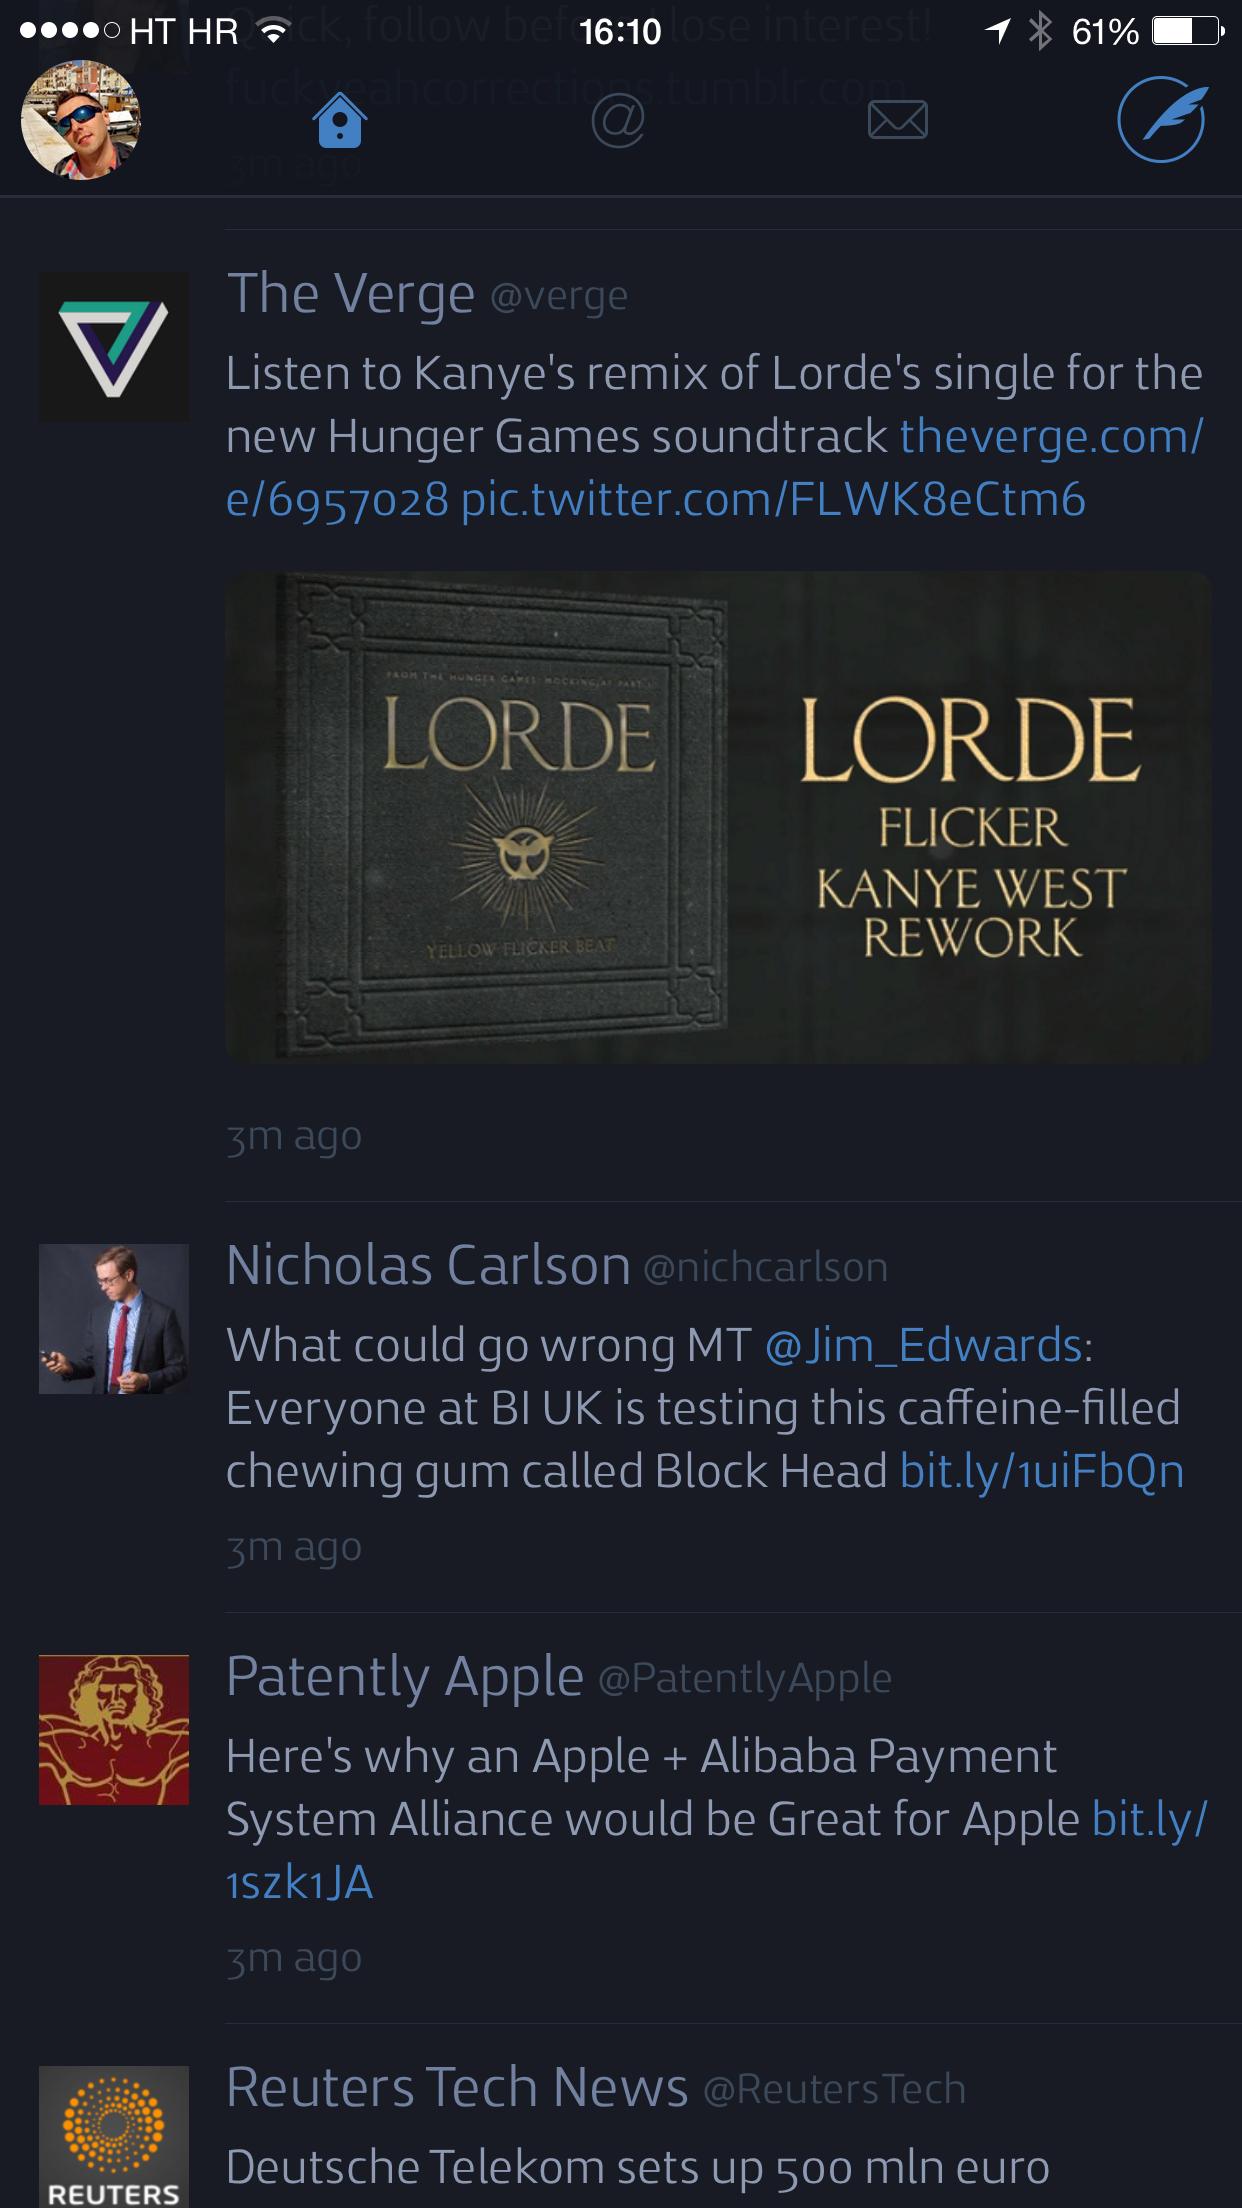 Twitterrific 5.8.2 for iOS (iPhone 6 screenshot 001)